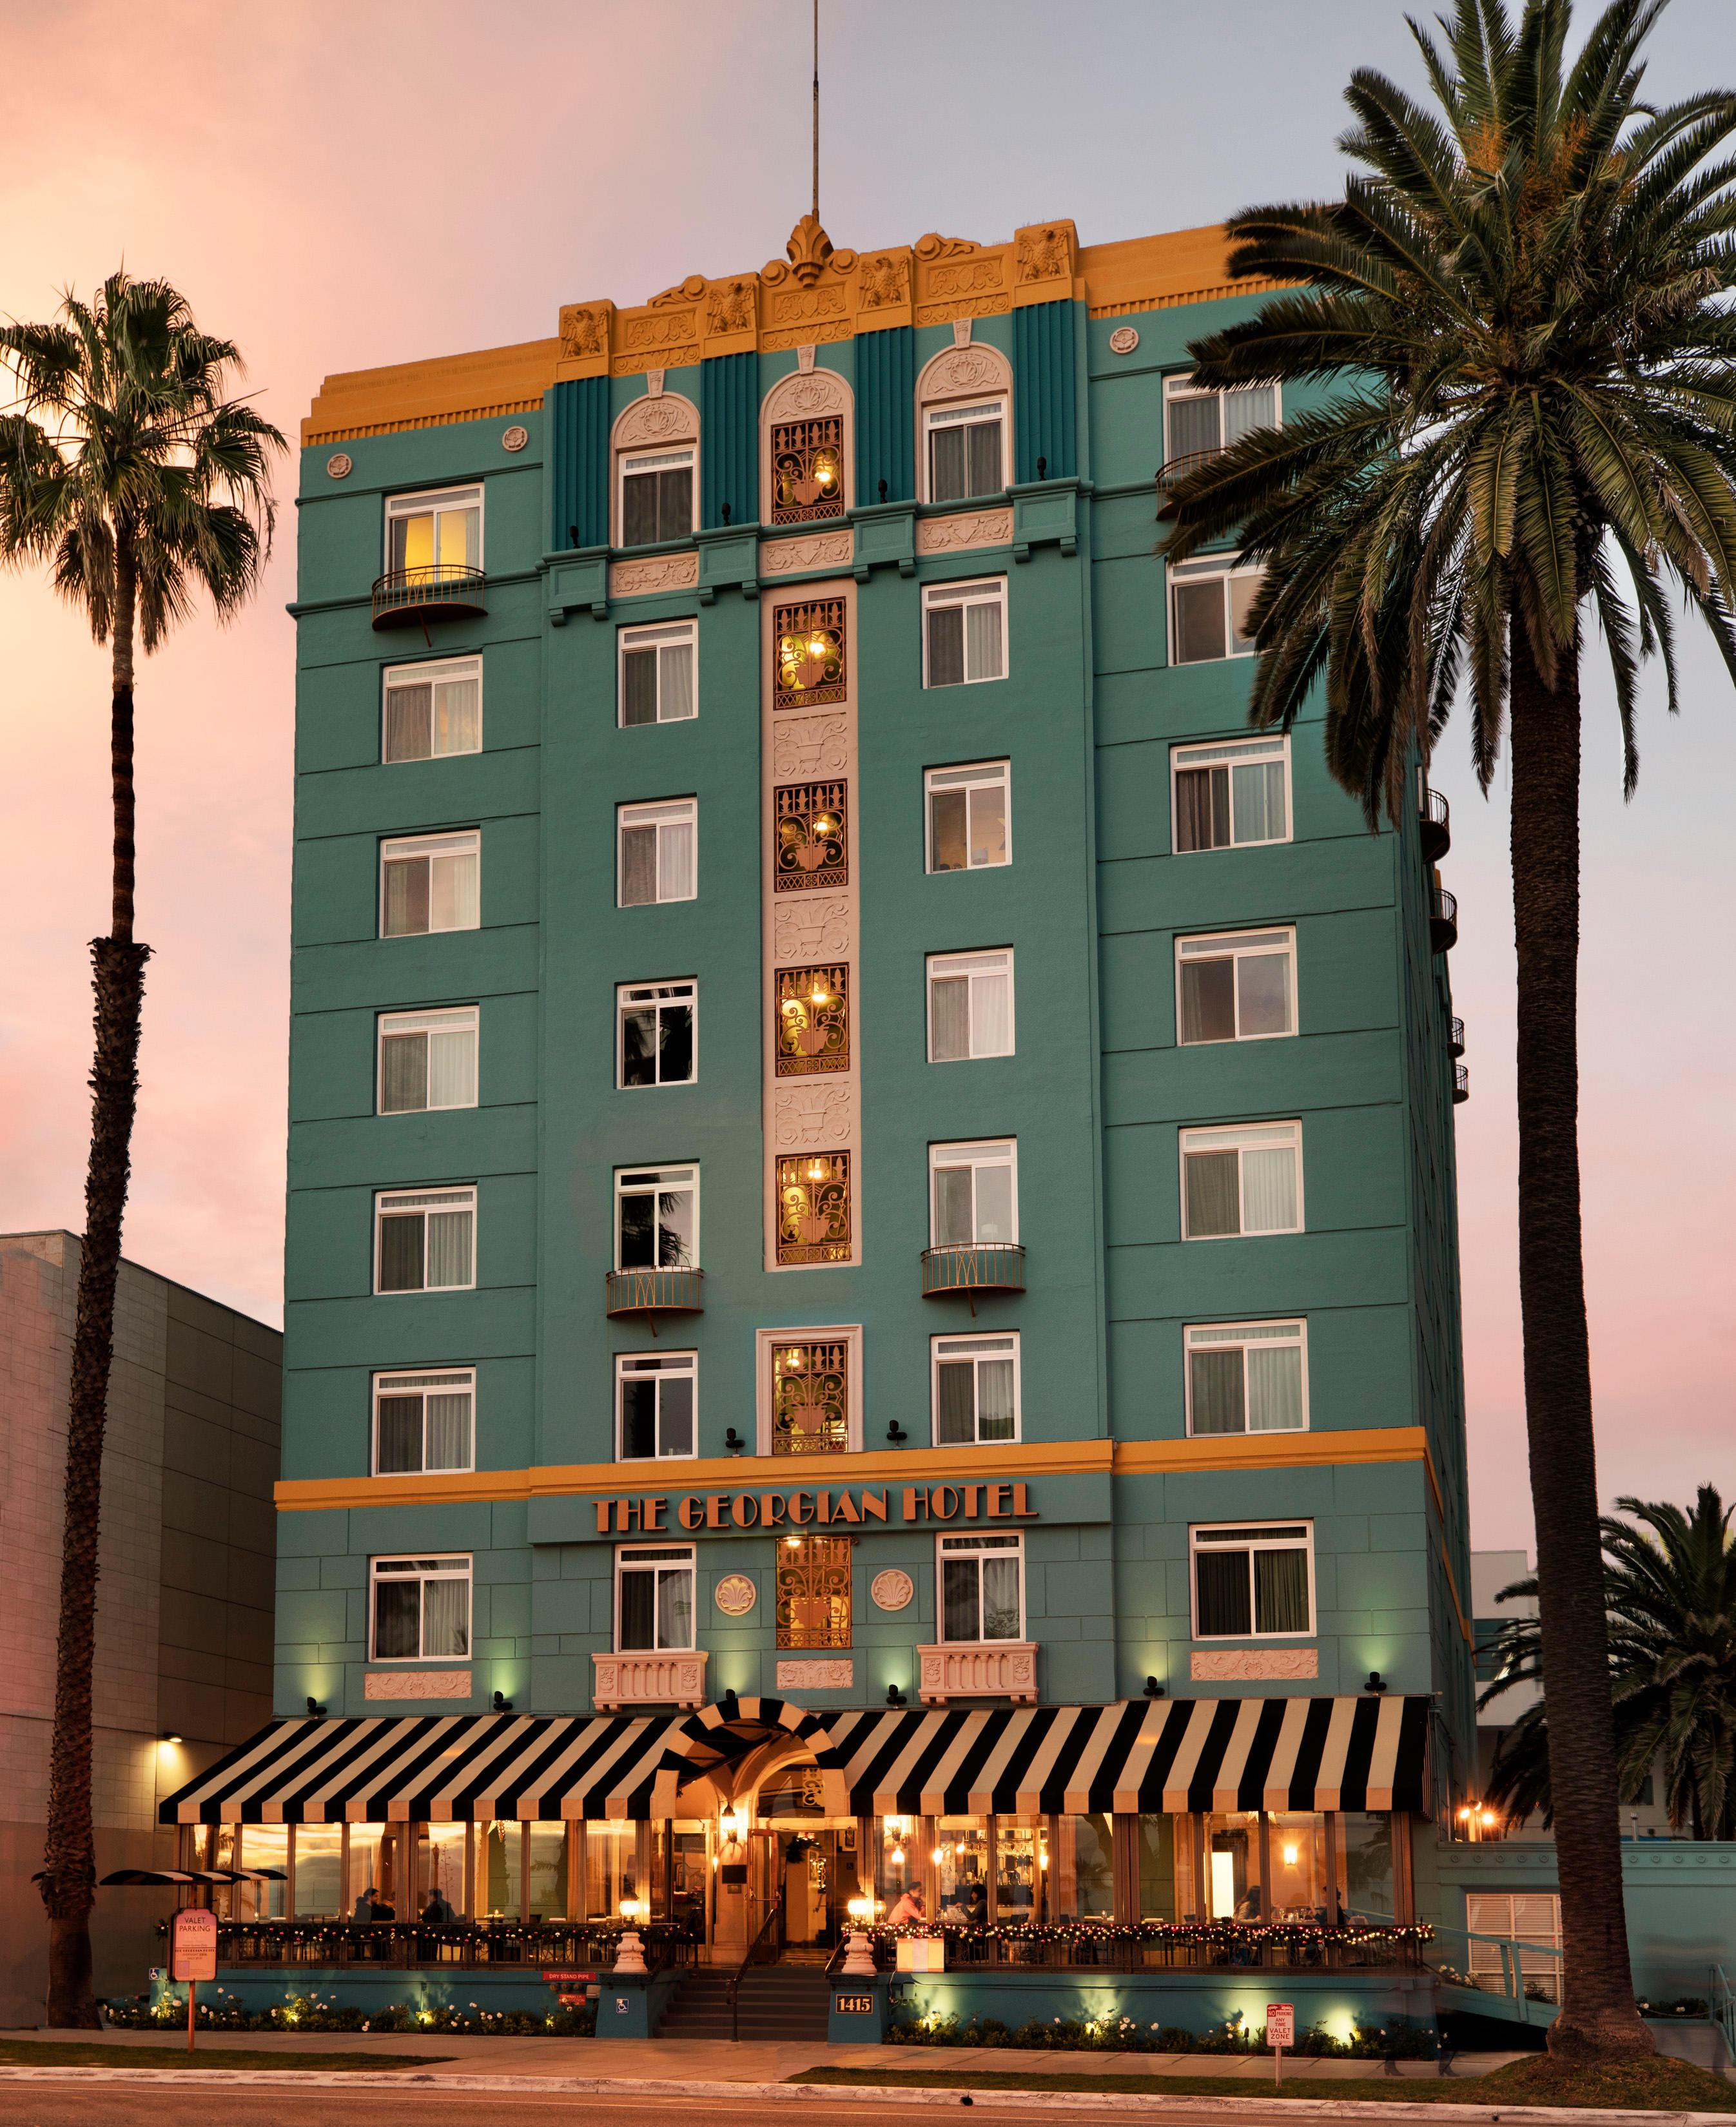 The Georgian Hotel in Santa Monica, CA, photo #2